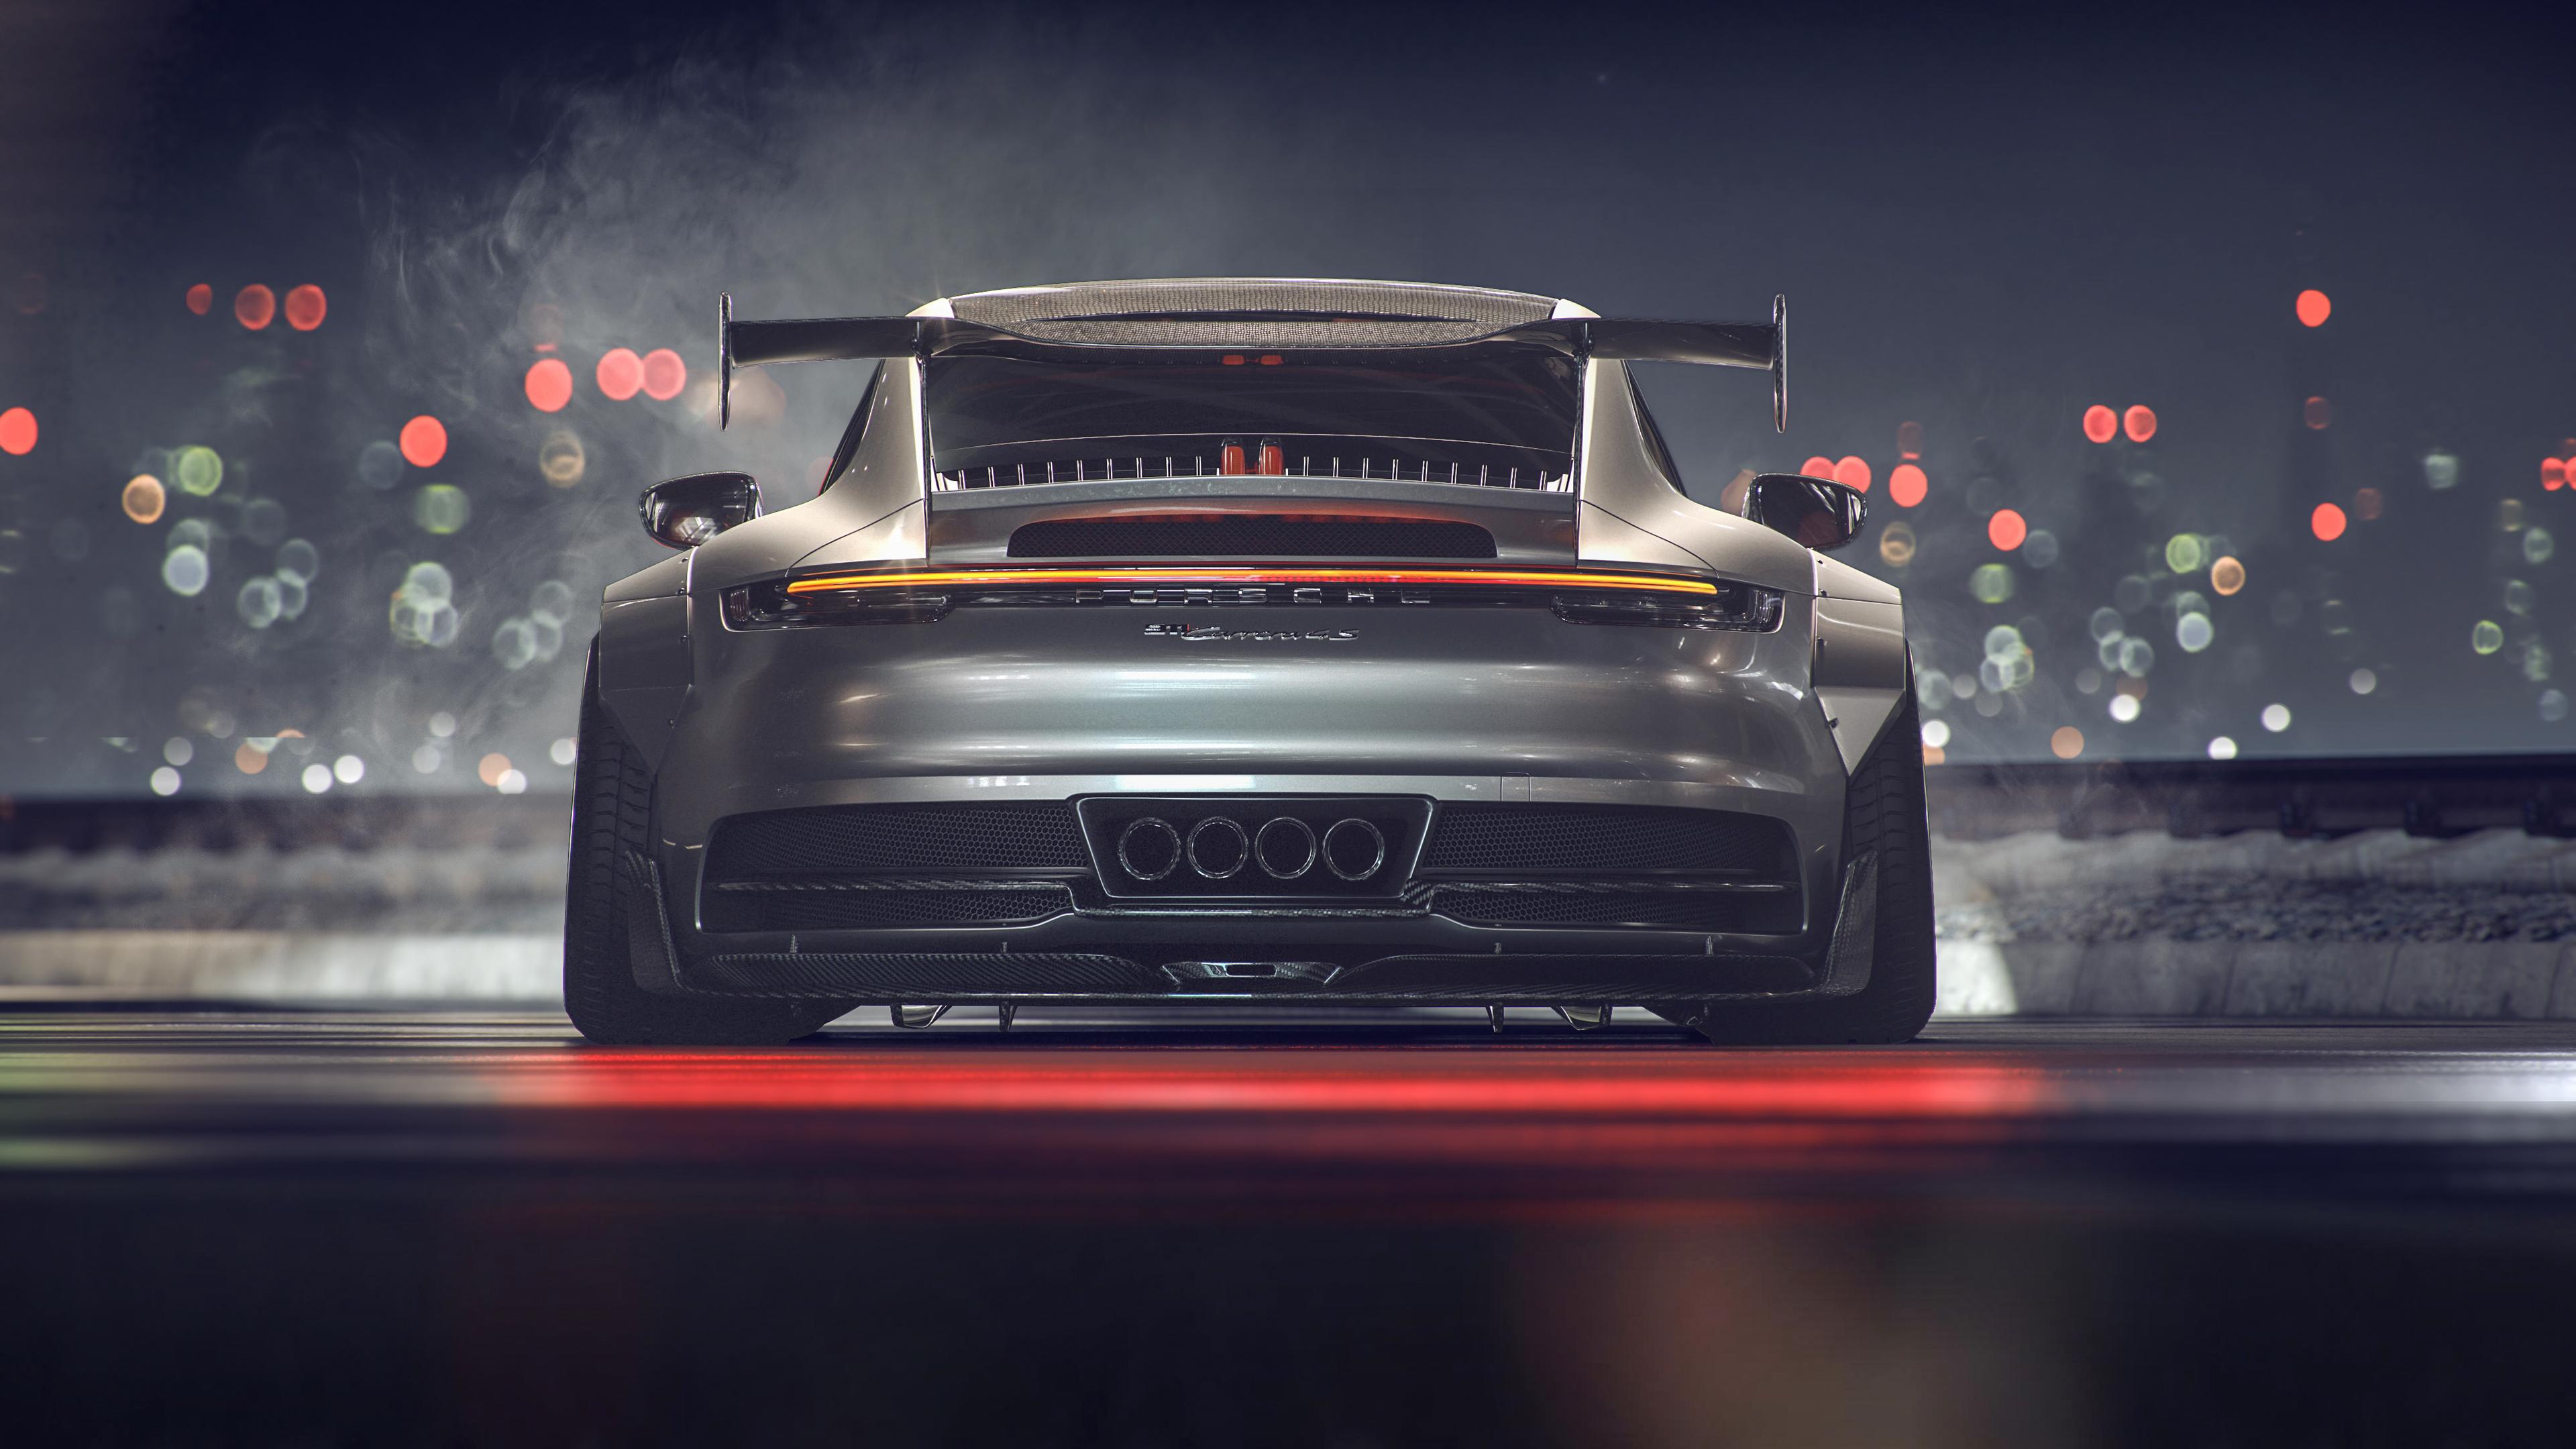 porsche gt3 911 gt rear 4k 1554245182 - Porsche GT3 911 GT Rear 4k - porsche wallpapers, porsche gt3 wallpapers, hd-wallpapers, cars wallpapers, behance wallpapers, 4k-wallpapers